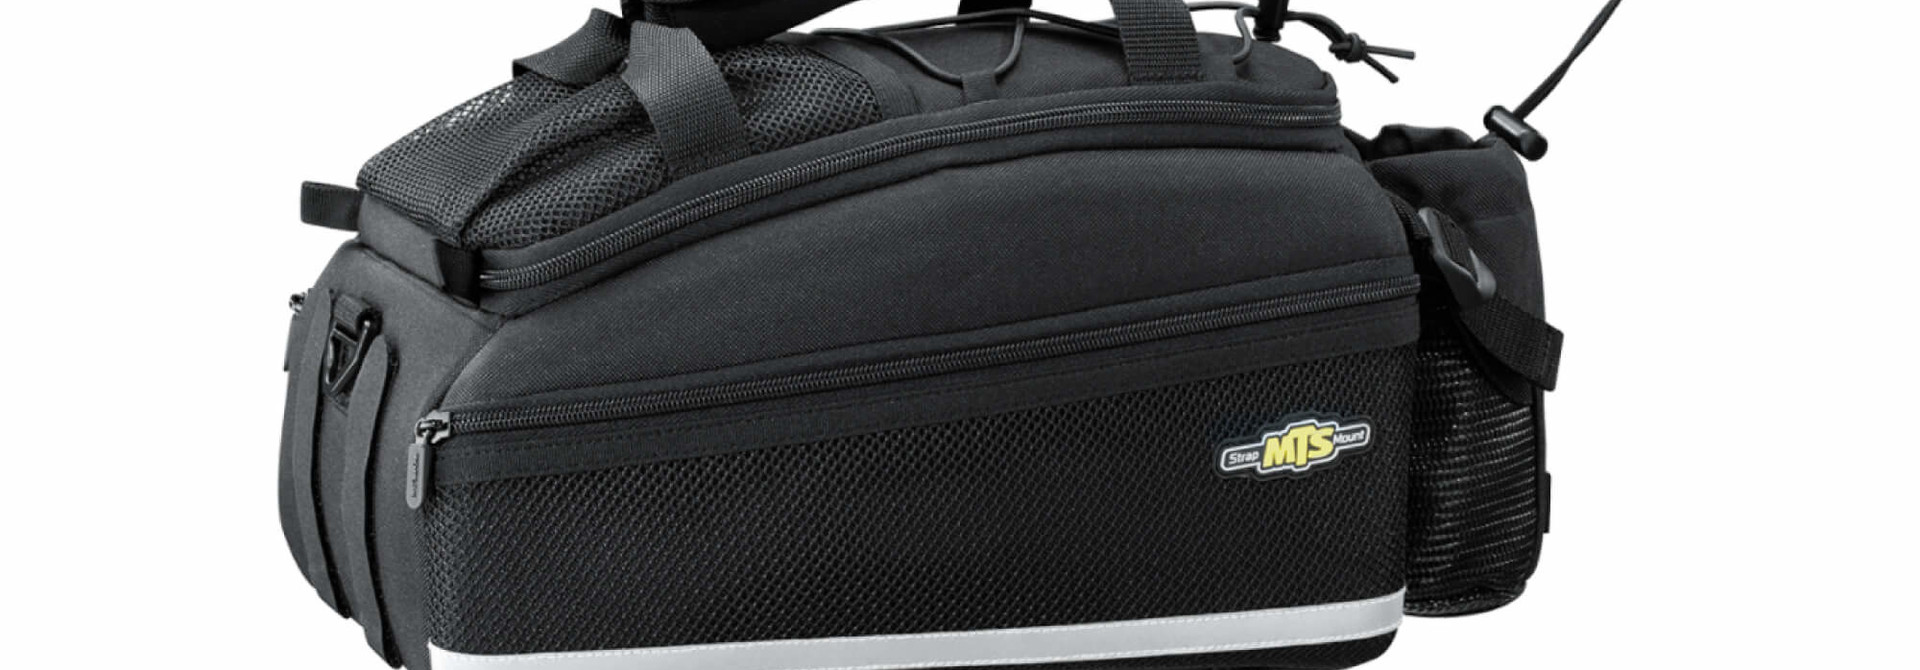 Trunk Bag EX - Velcro Strap Version